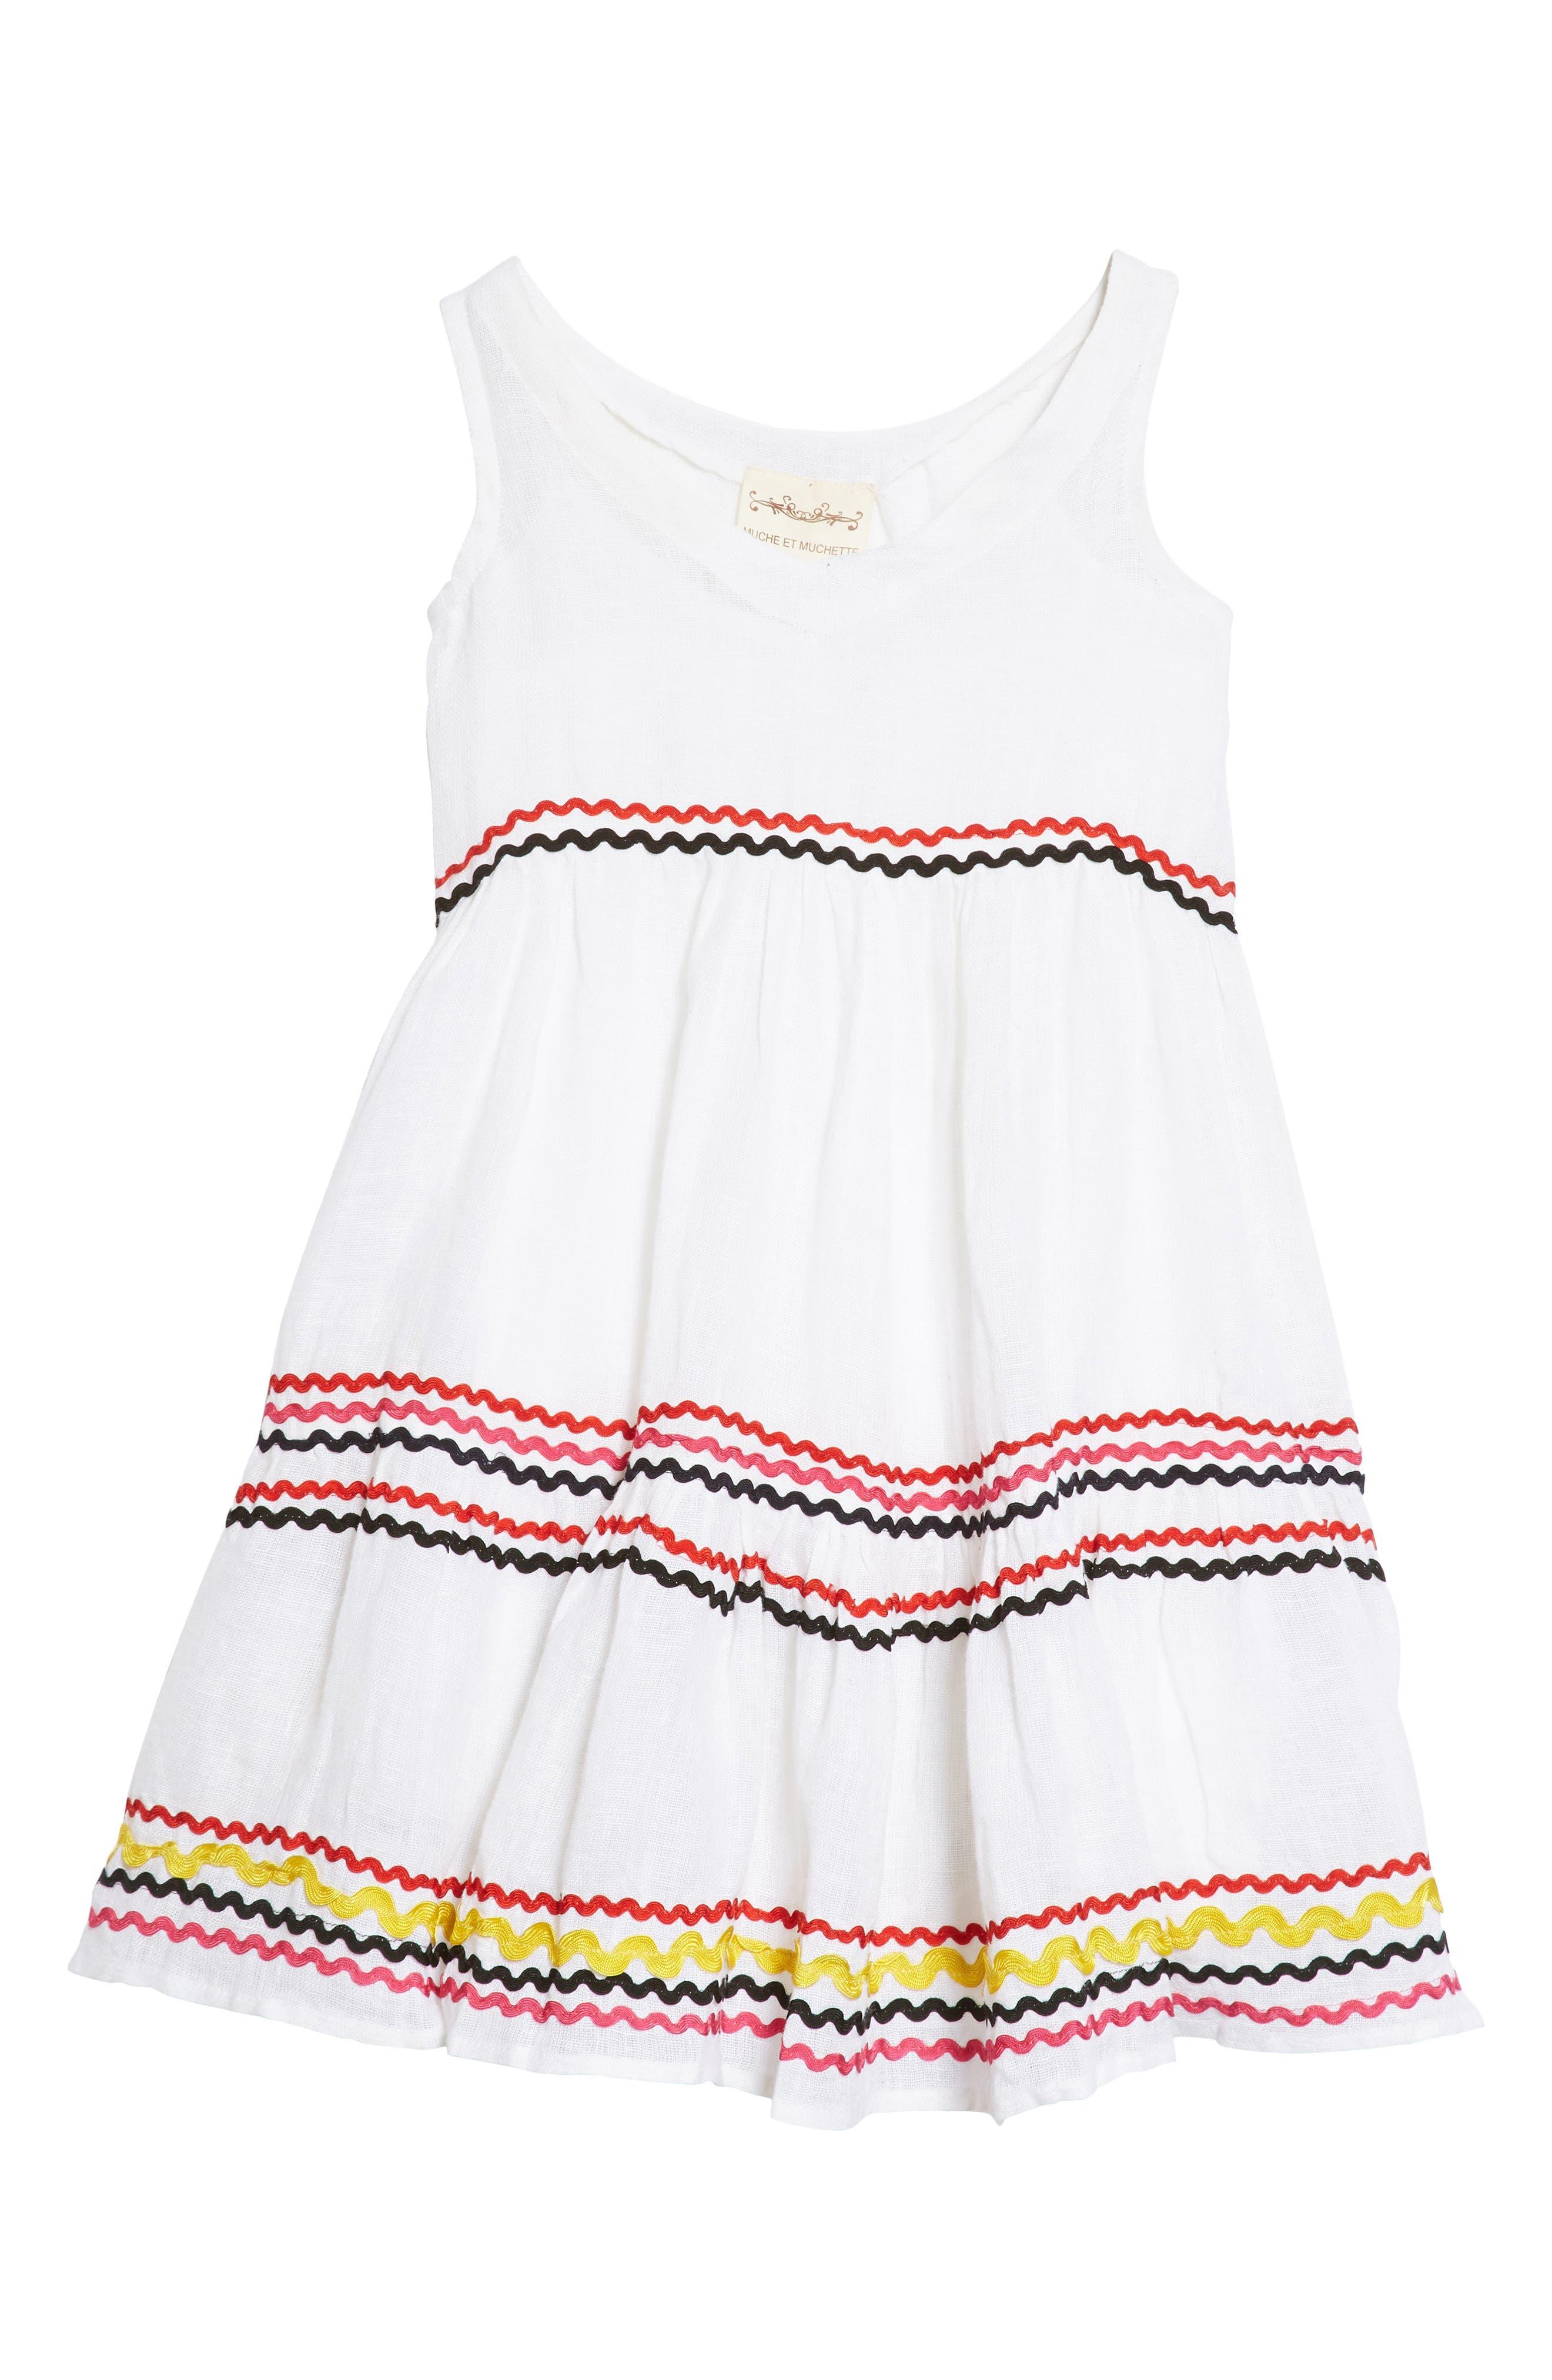 MUCHE ET MUCHETTE Mira Linen Dress, Main, color, 100